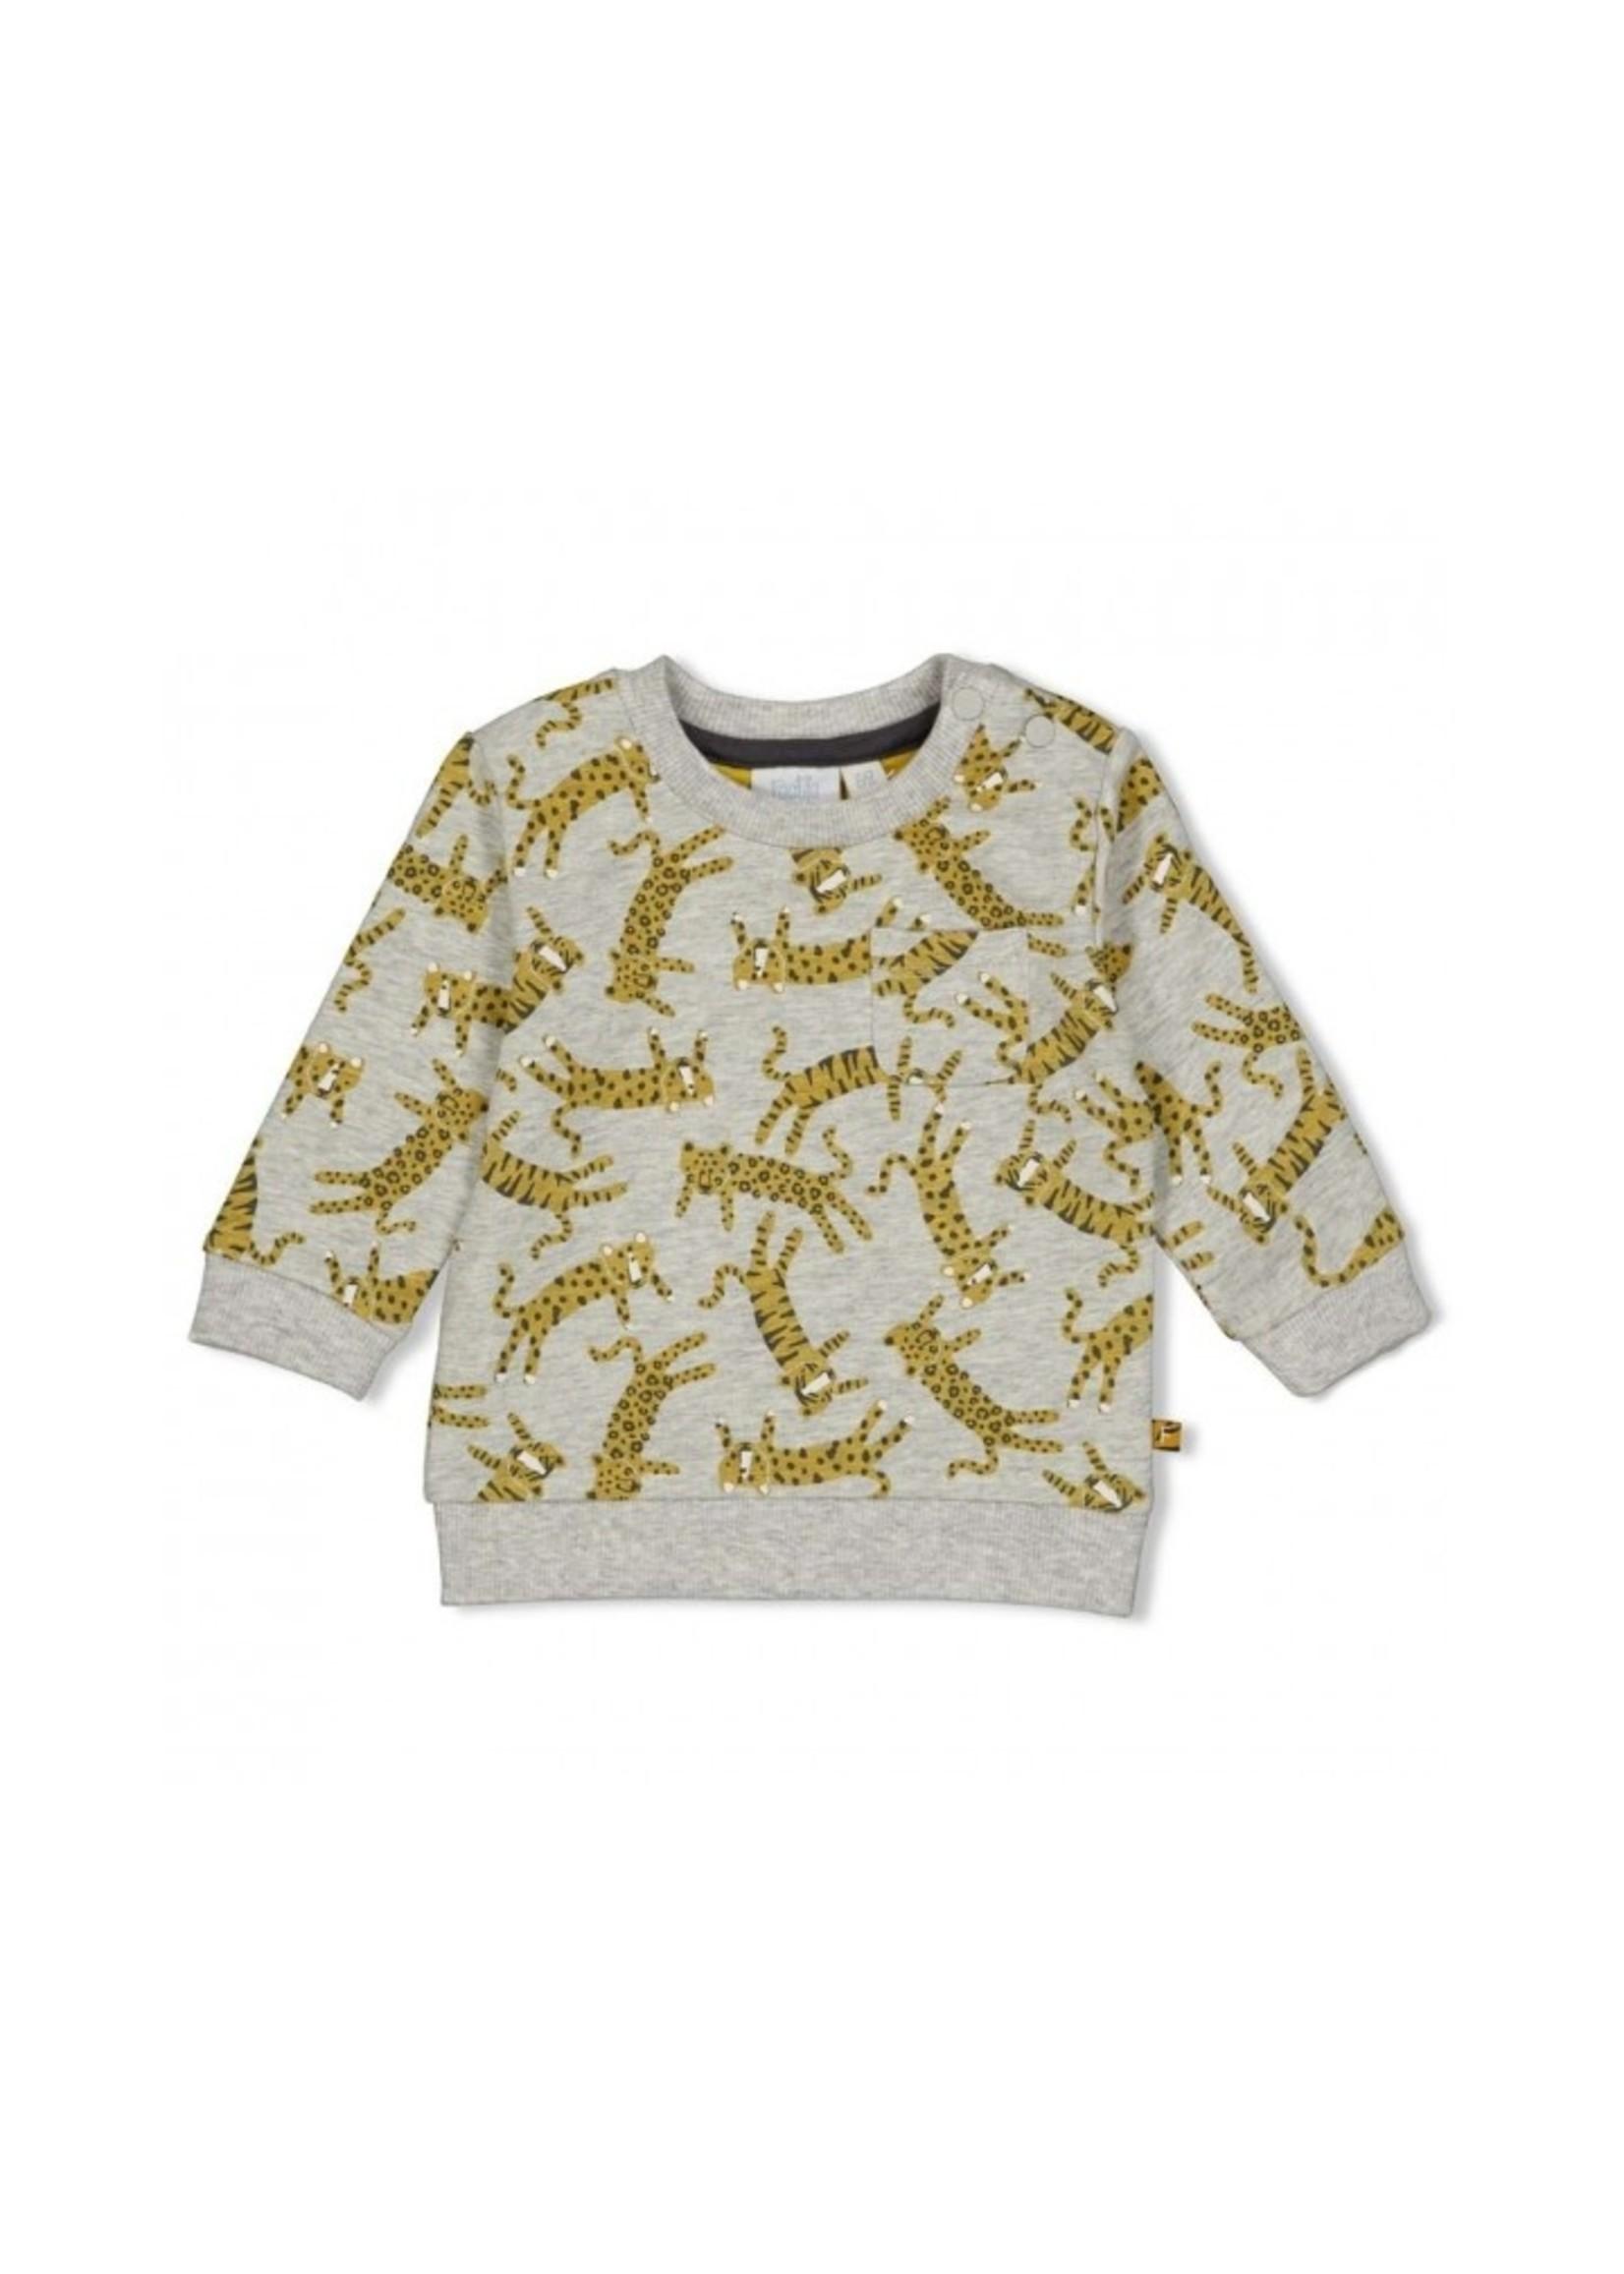 Feetje Sweater - Go Wild